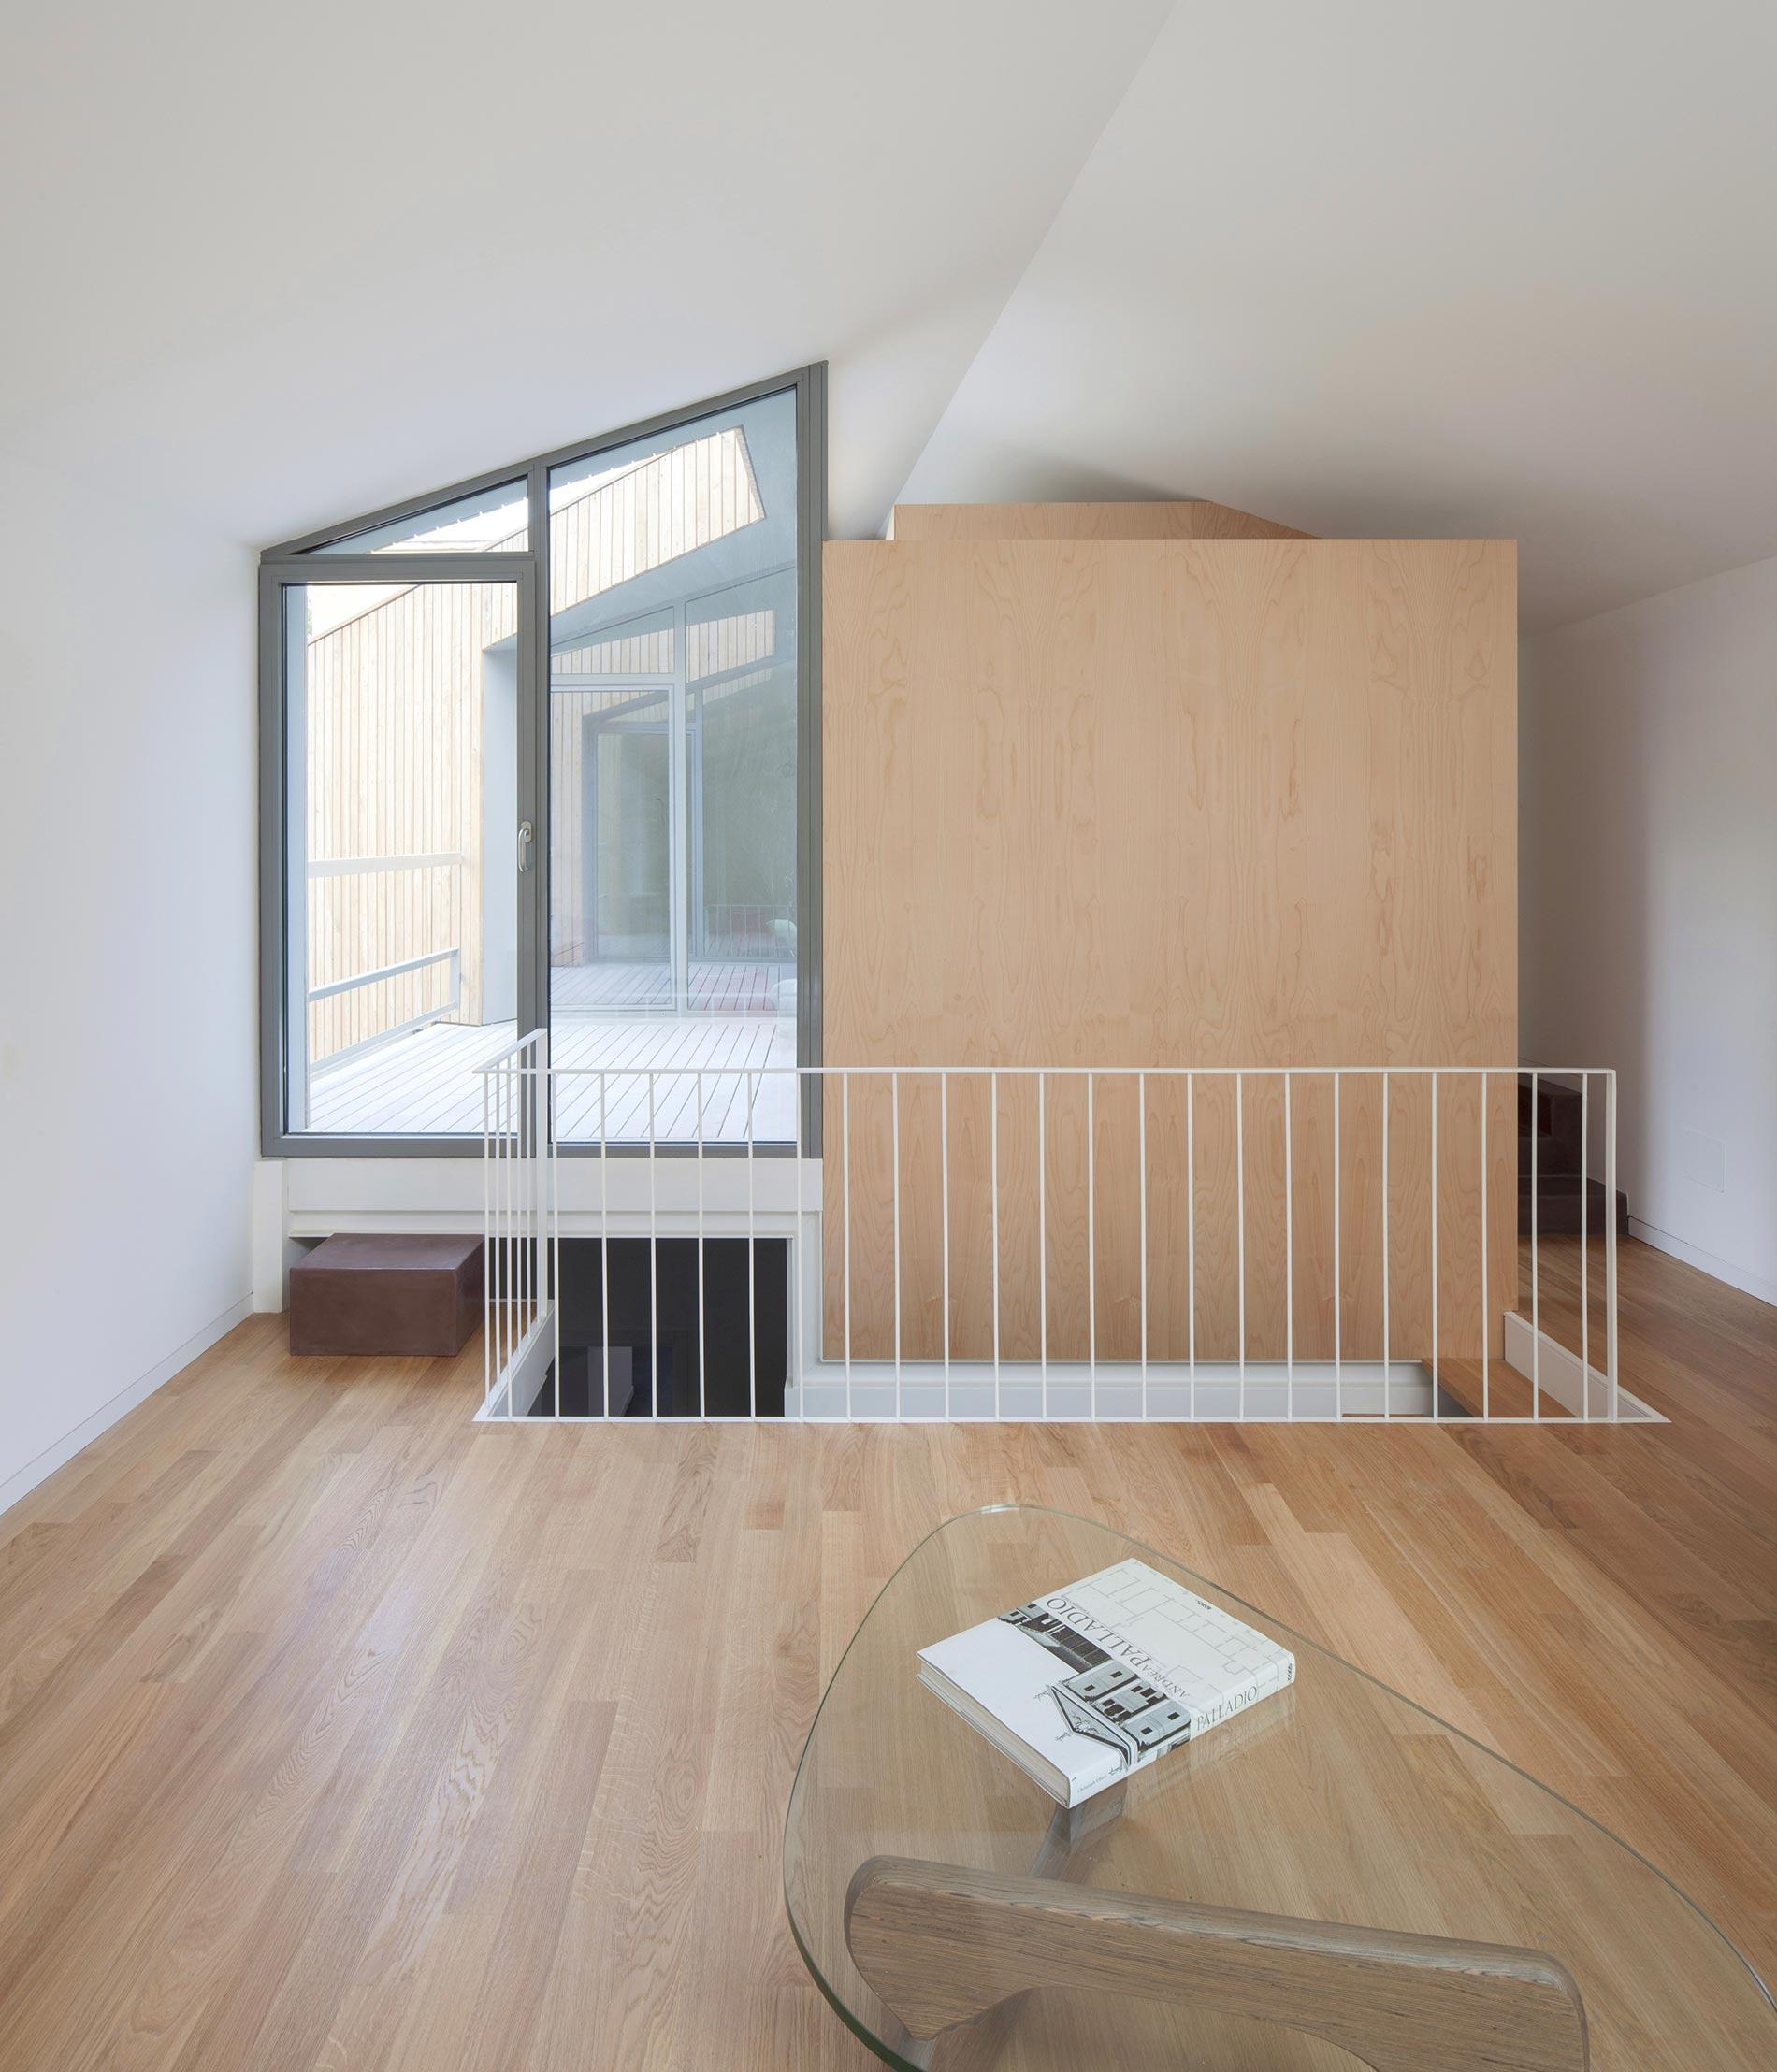 angular-urban-home-in-catania-italy-9